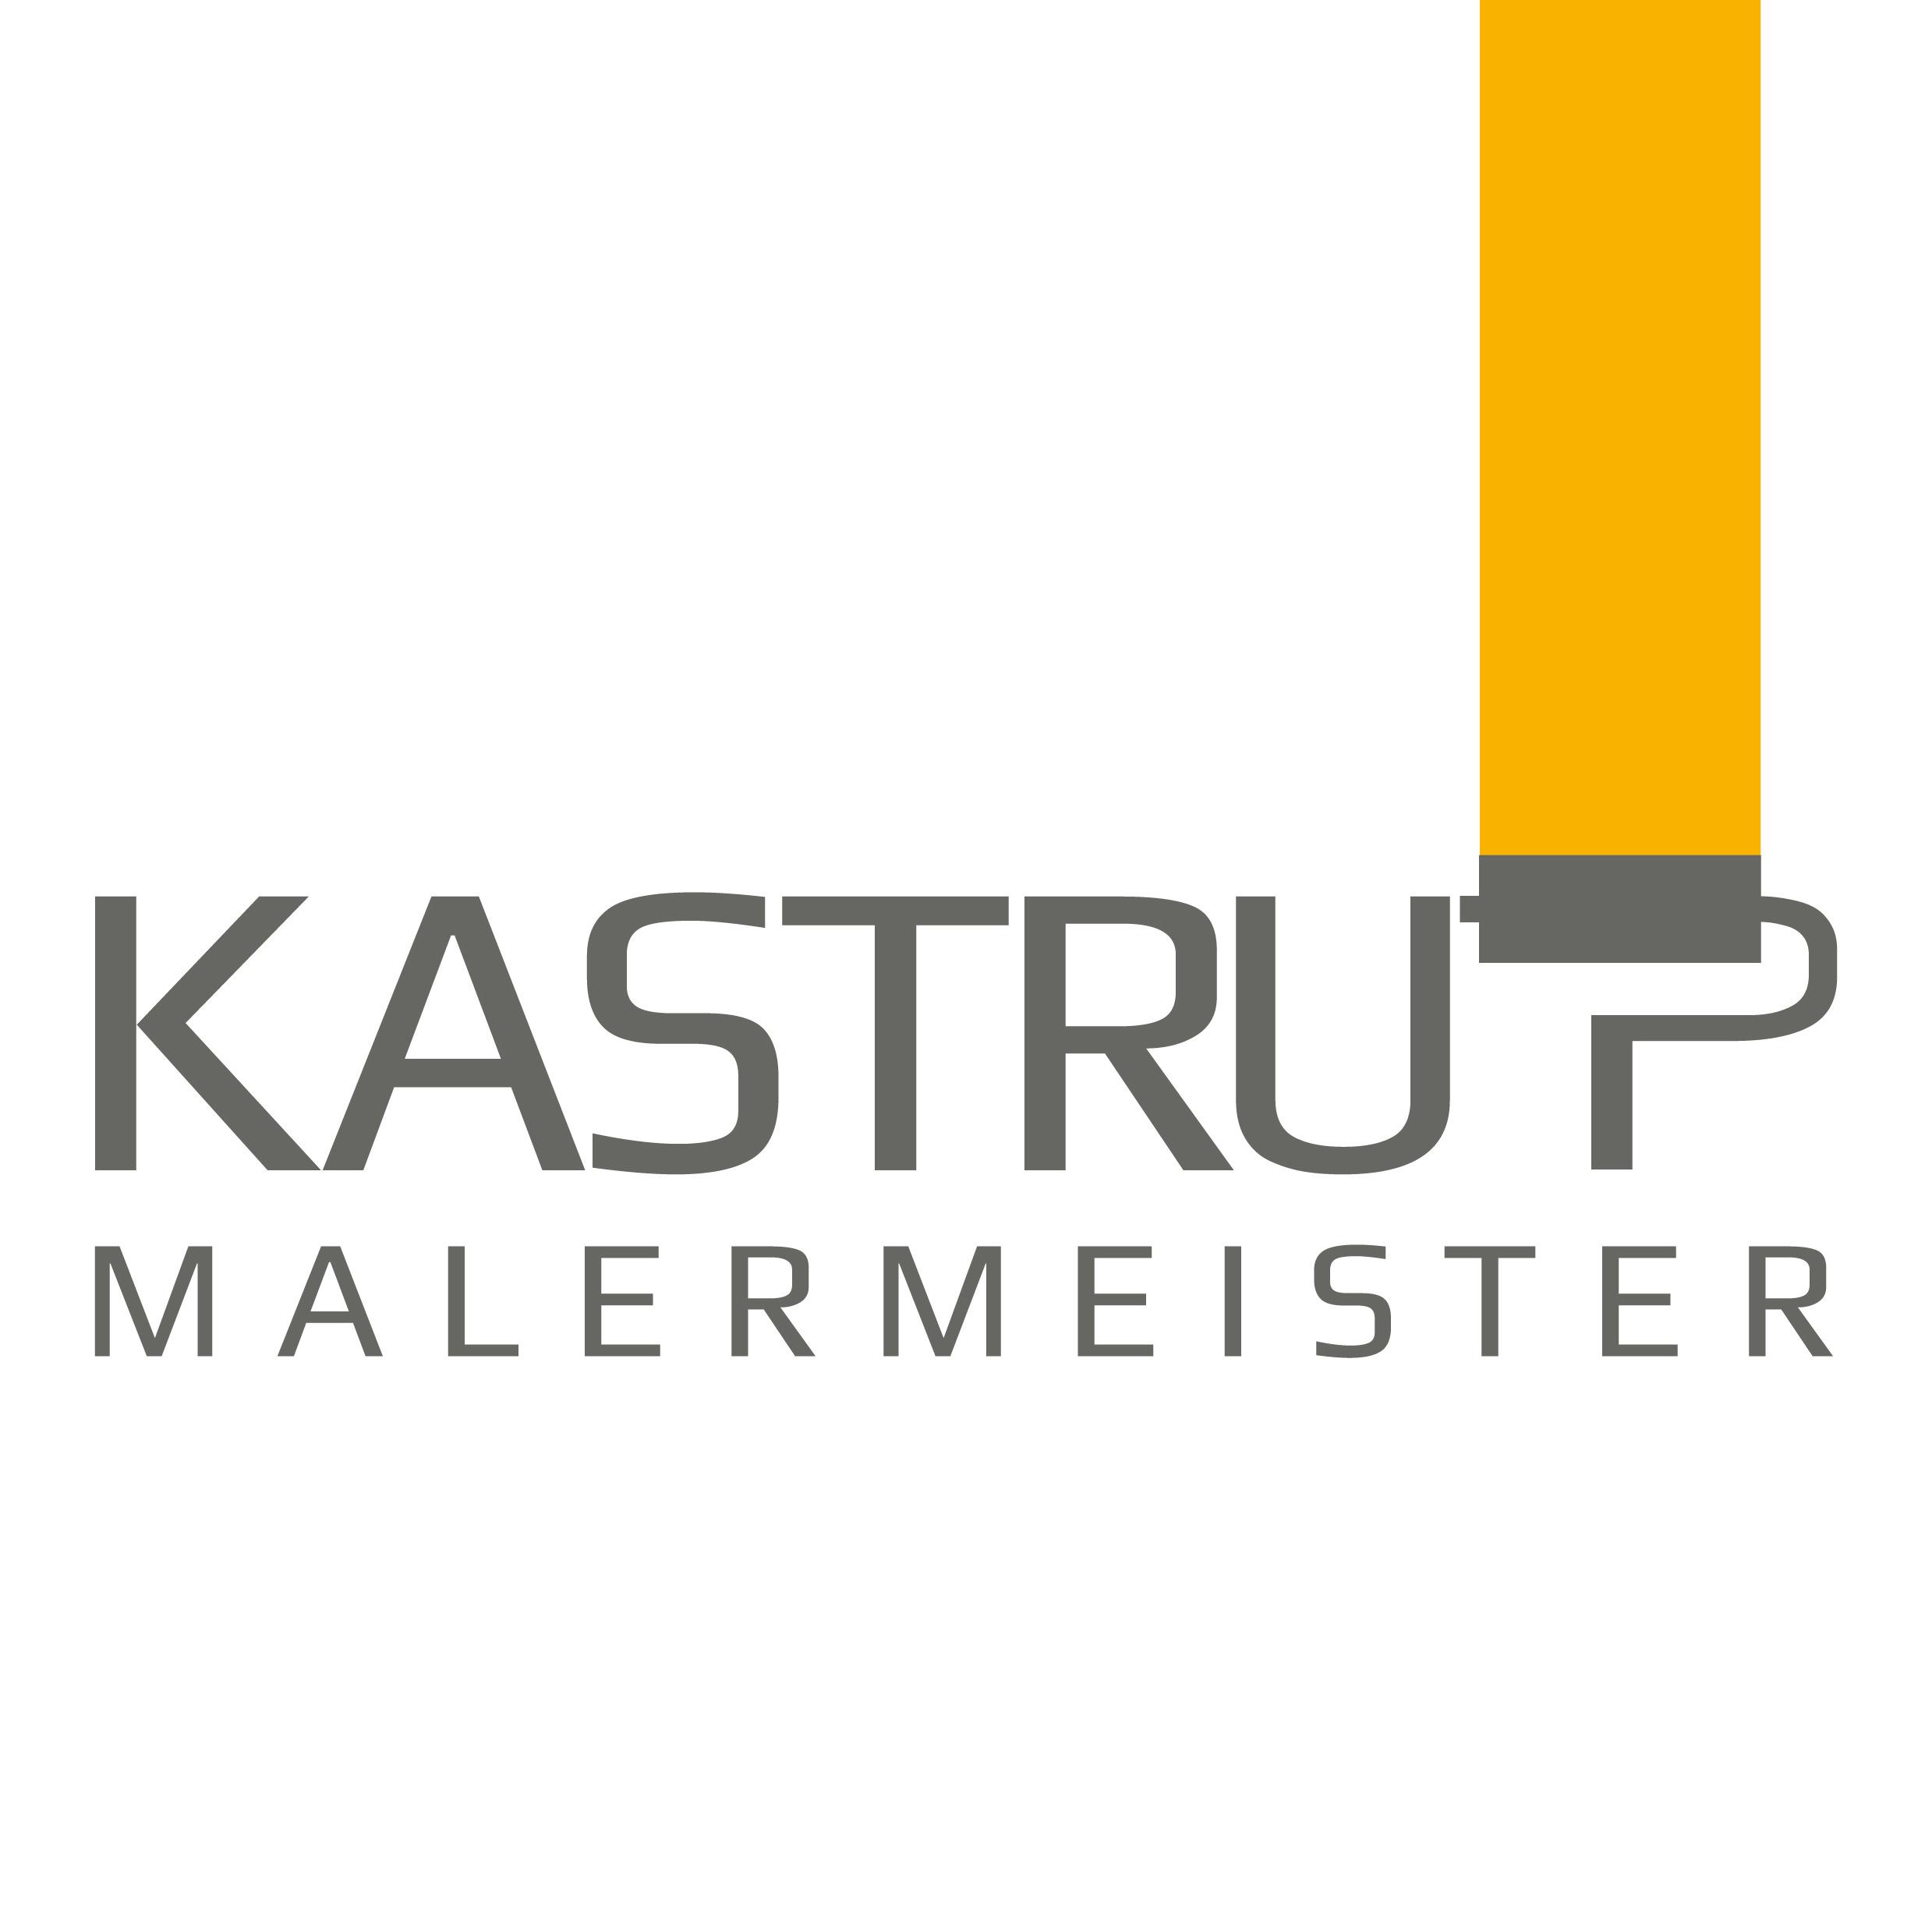 Bild zu Malermeister Kastrup GbR in Lotte